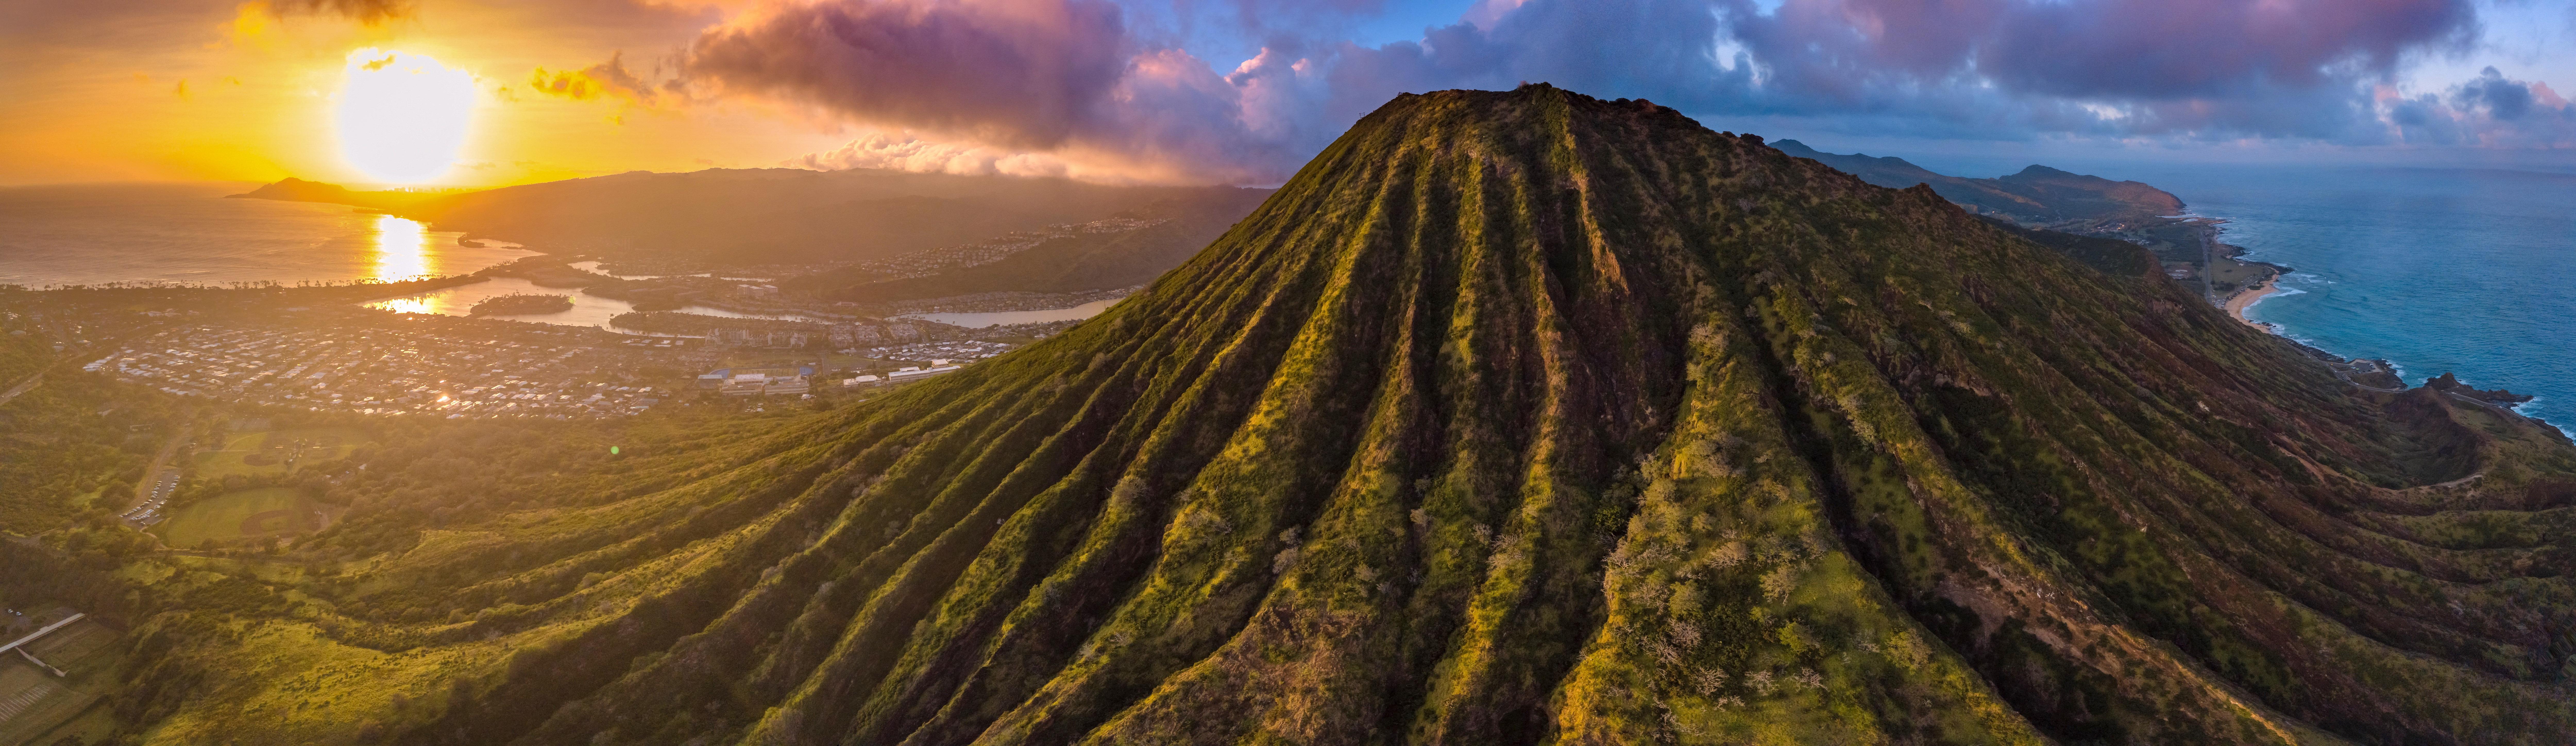 Hawaiian Sunset near Koko Crater